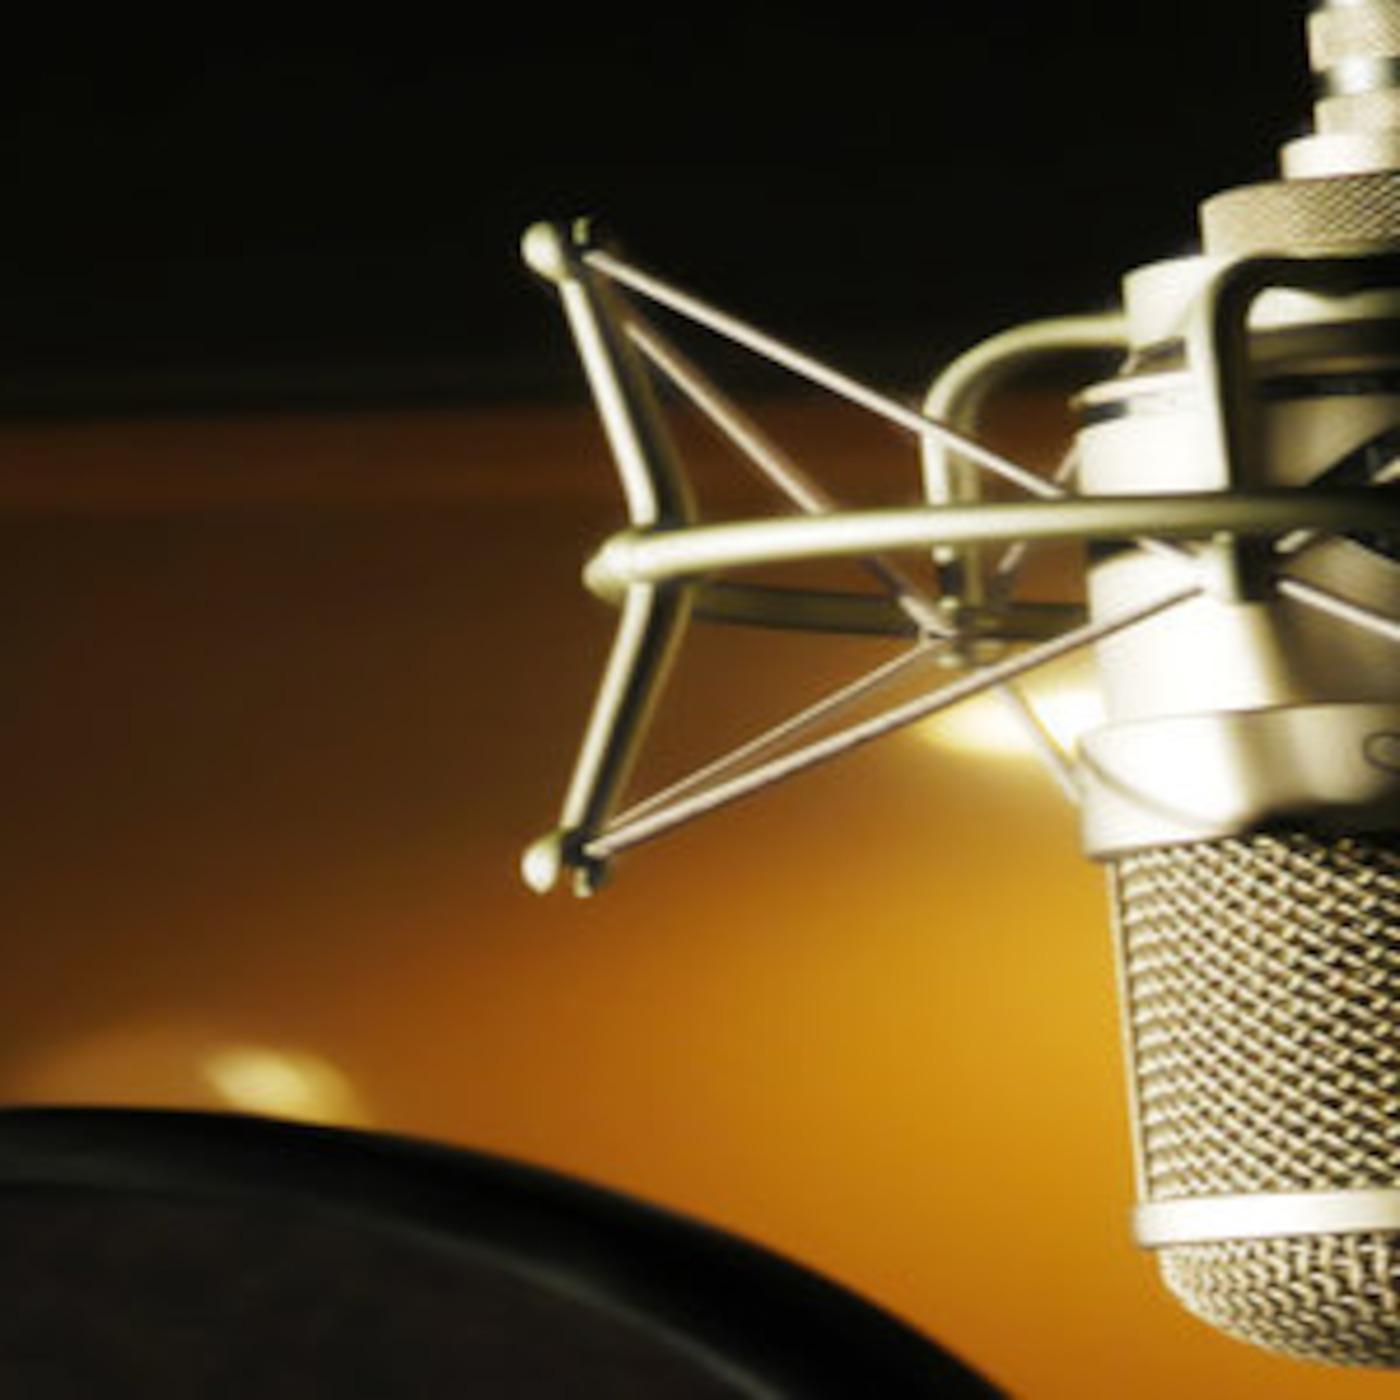 djmistri40@gmail.com's Podcast